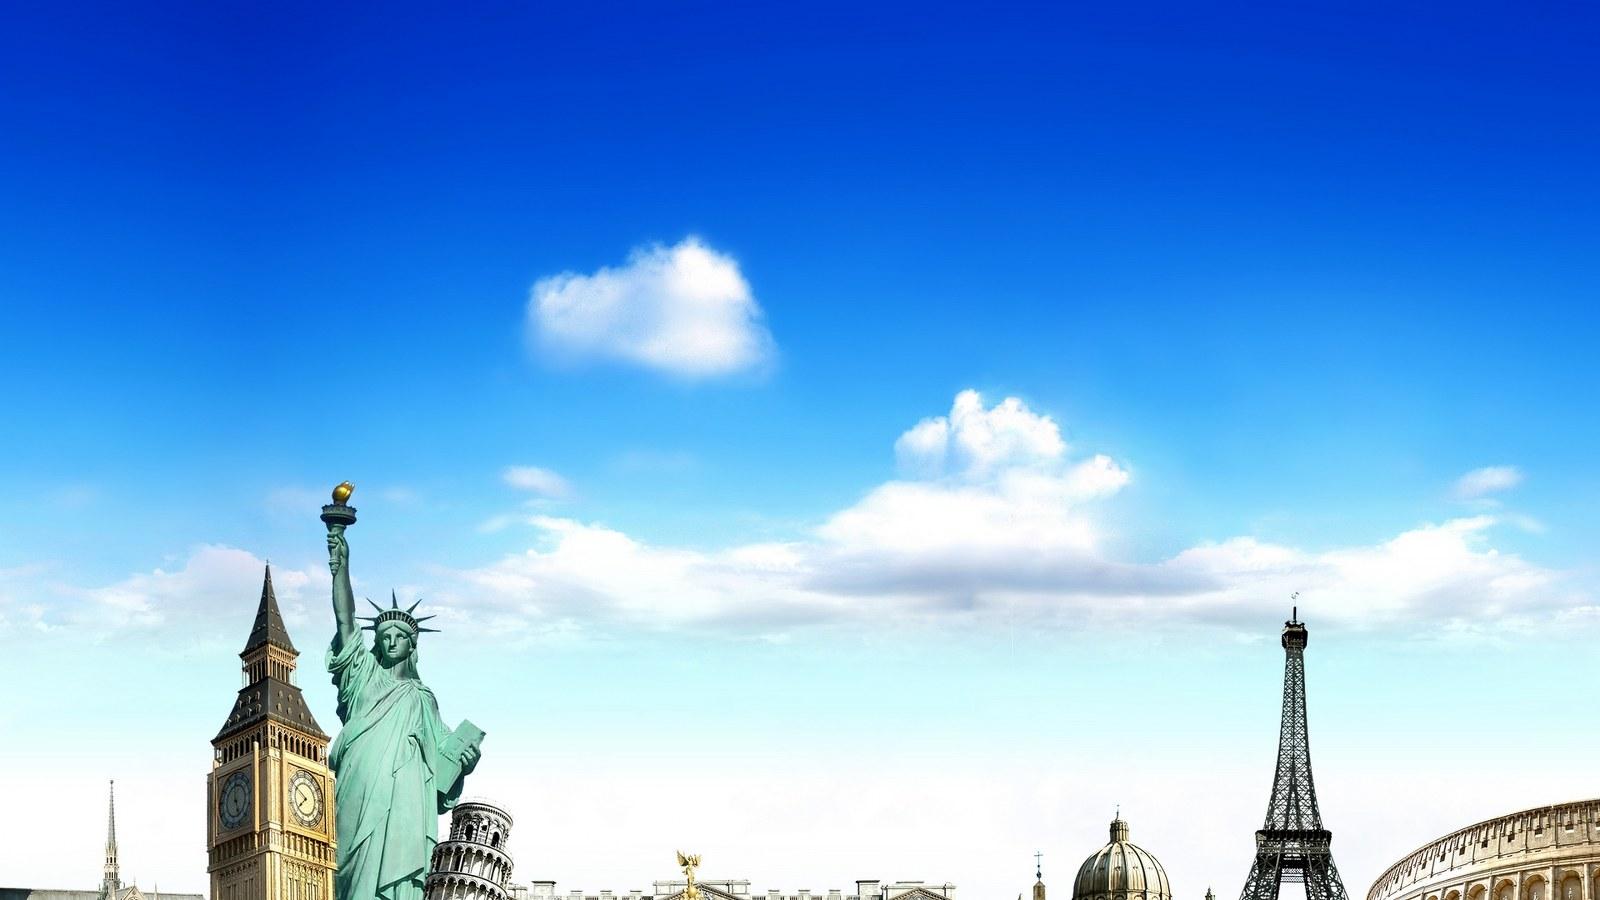 Statue Of Liberty Wonder Wallpaper   Travel HD Wallpapers 1600x900